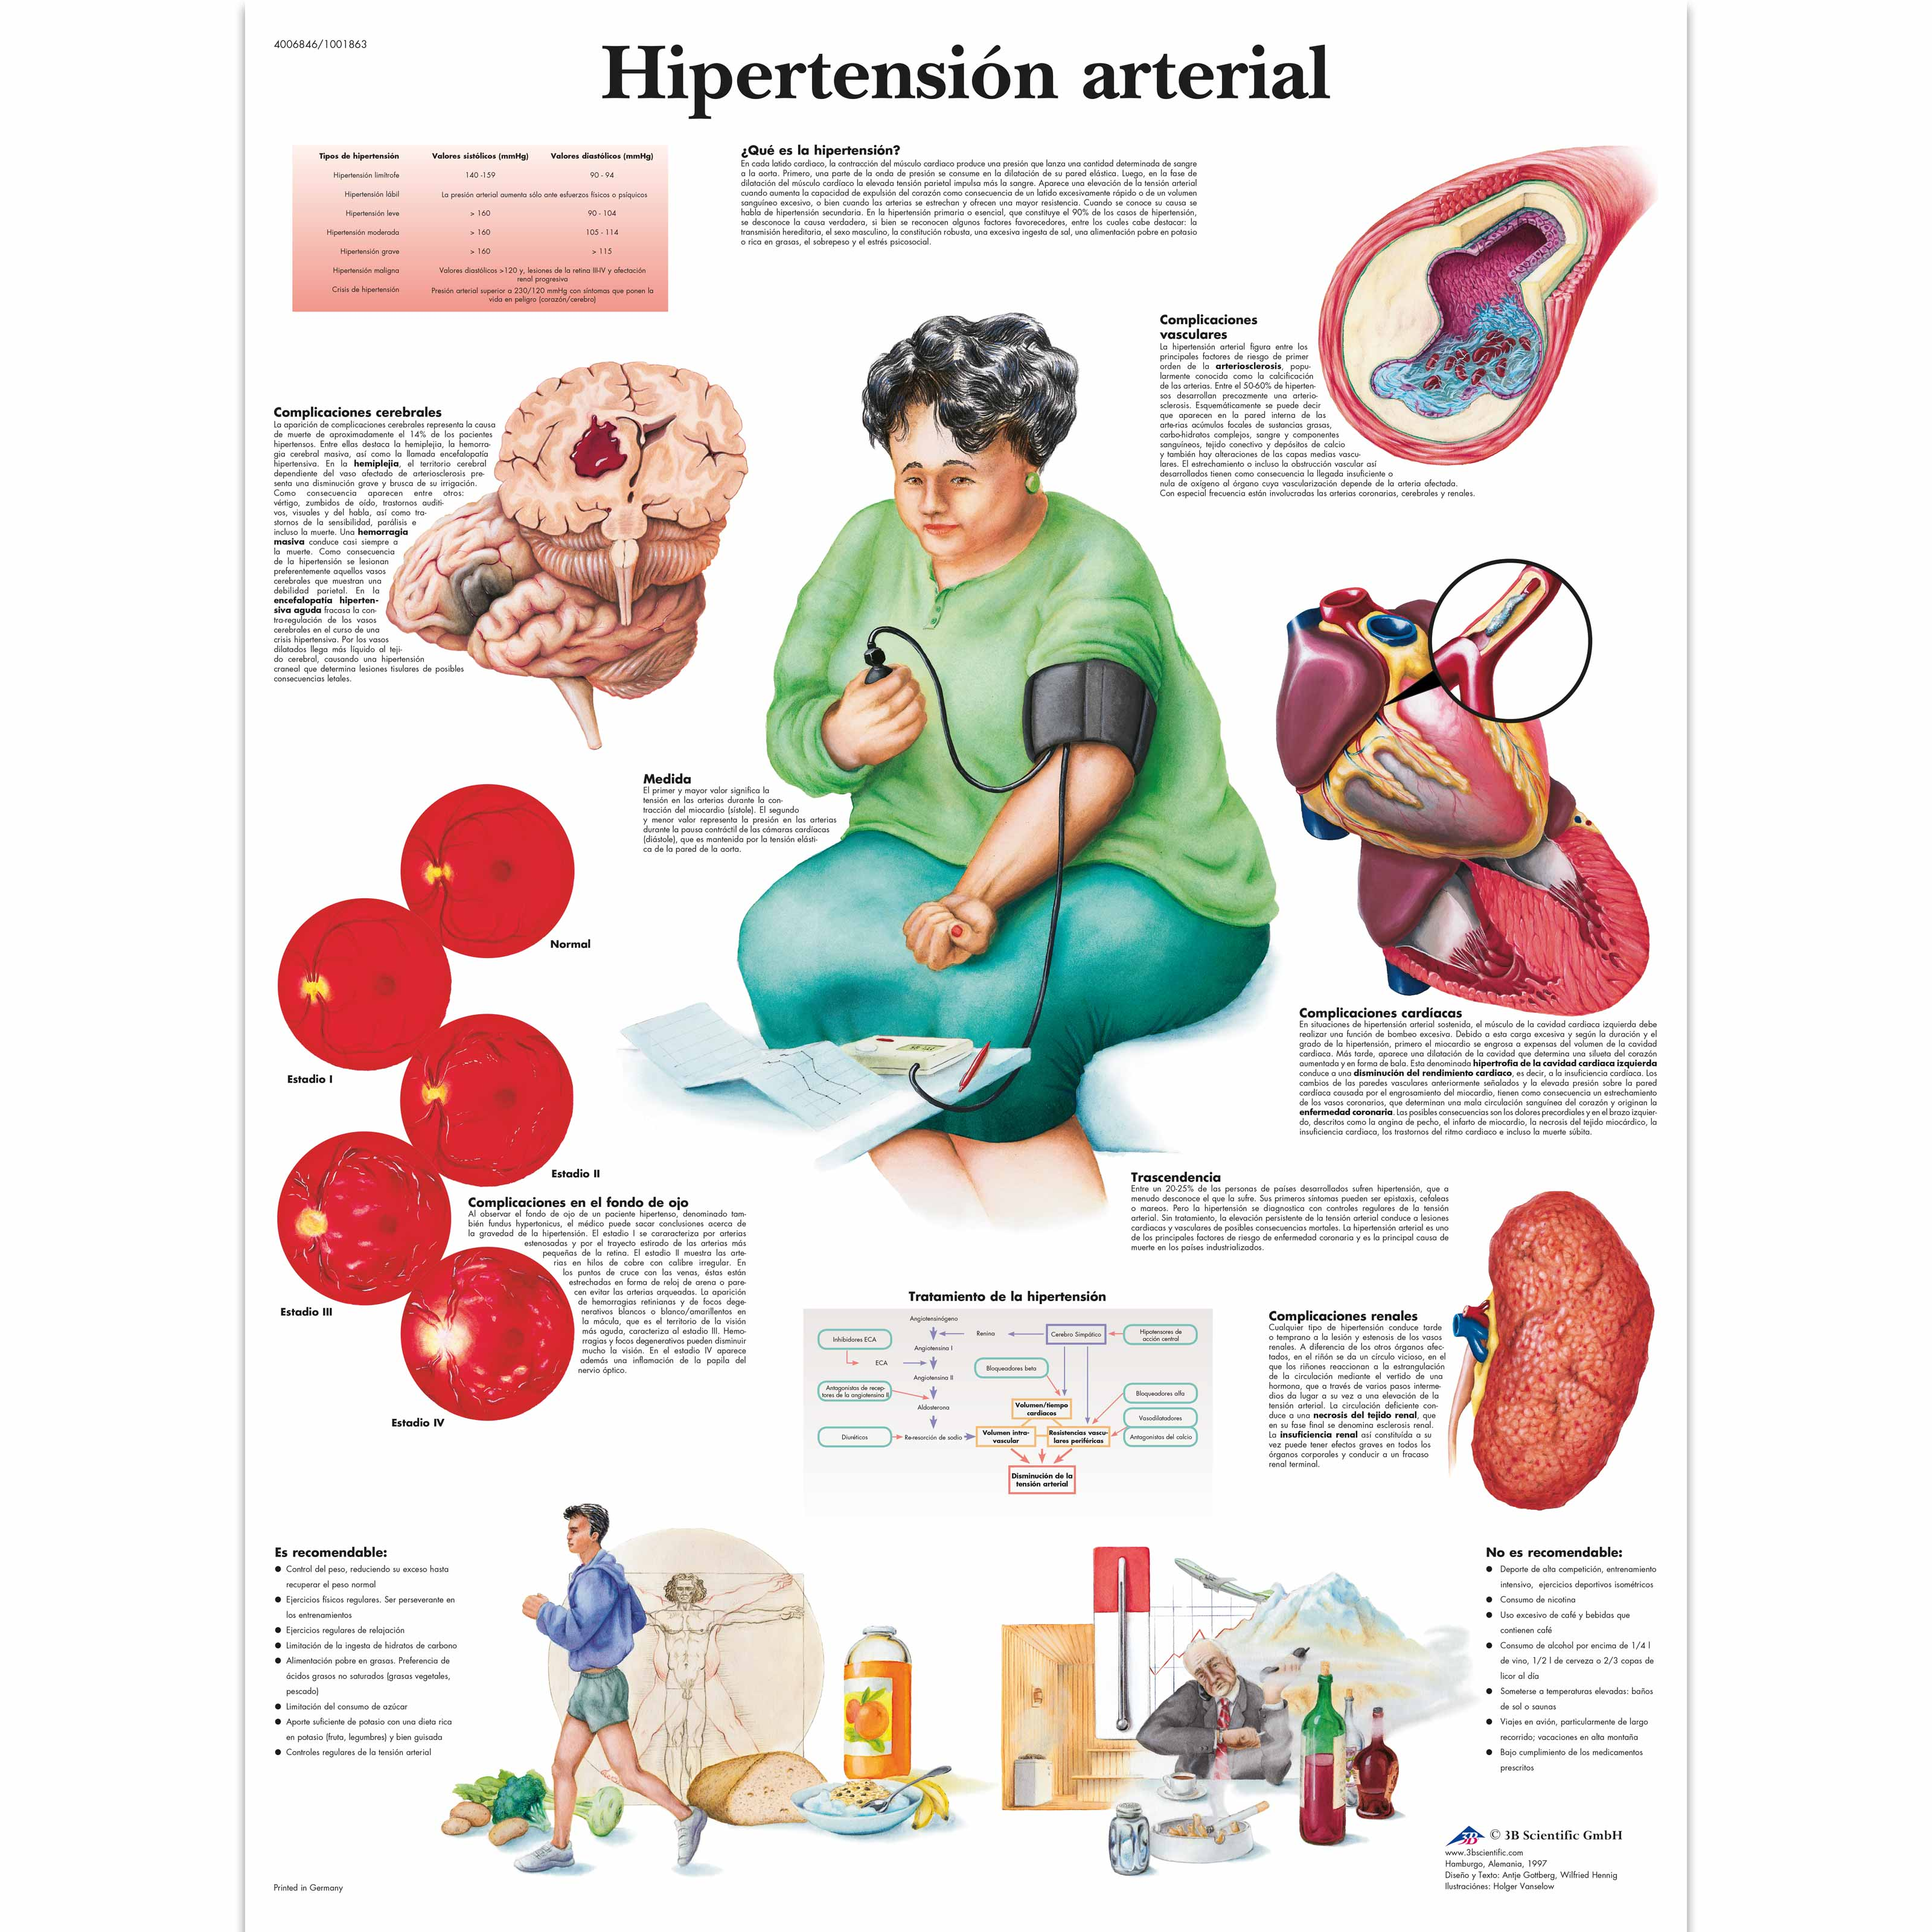 Agonista alfa 2 hipertensión